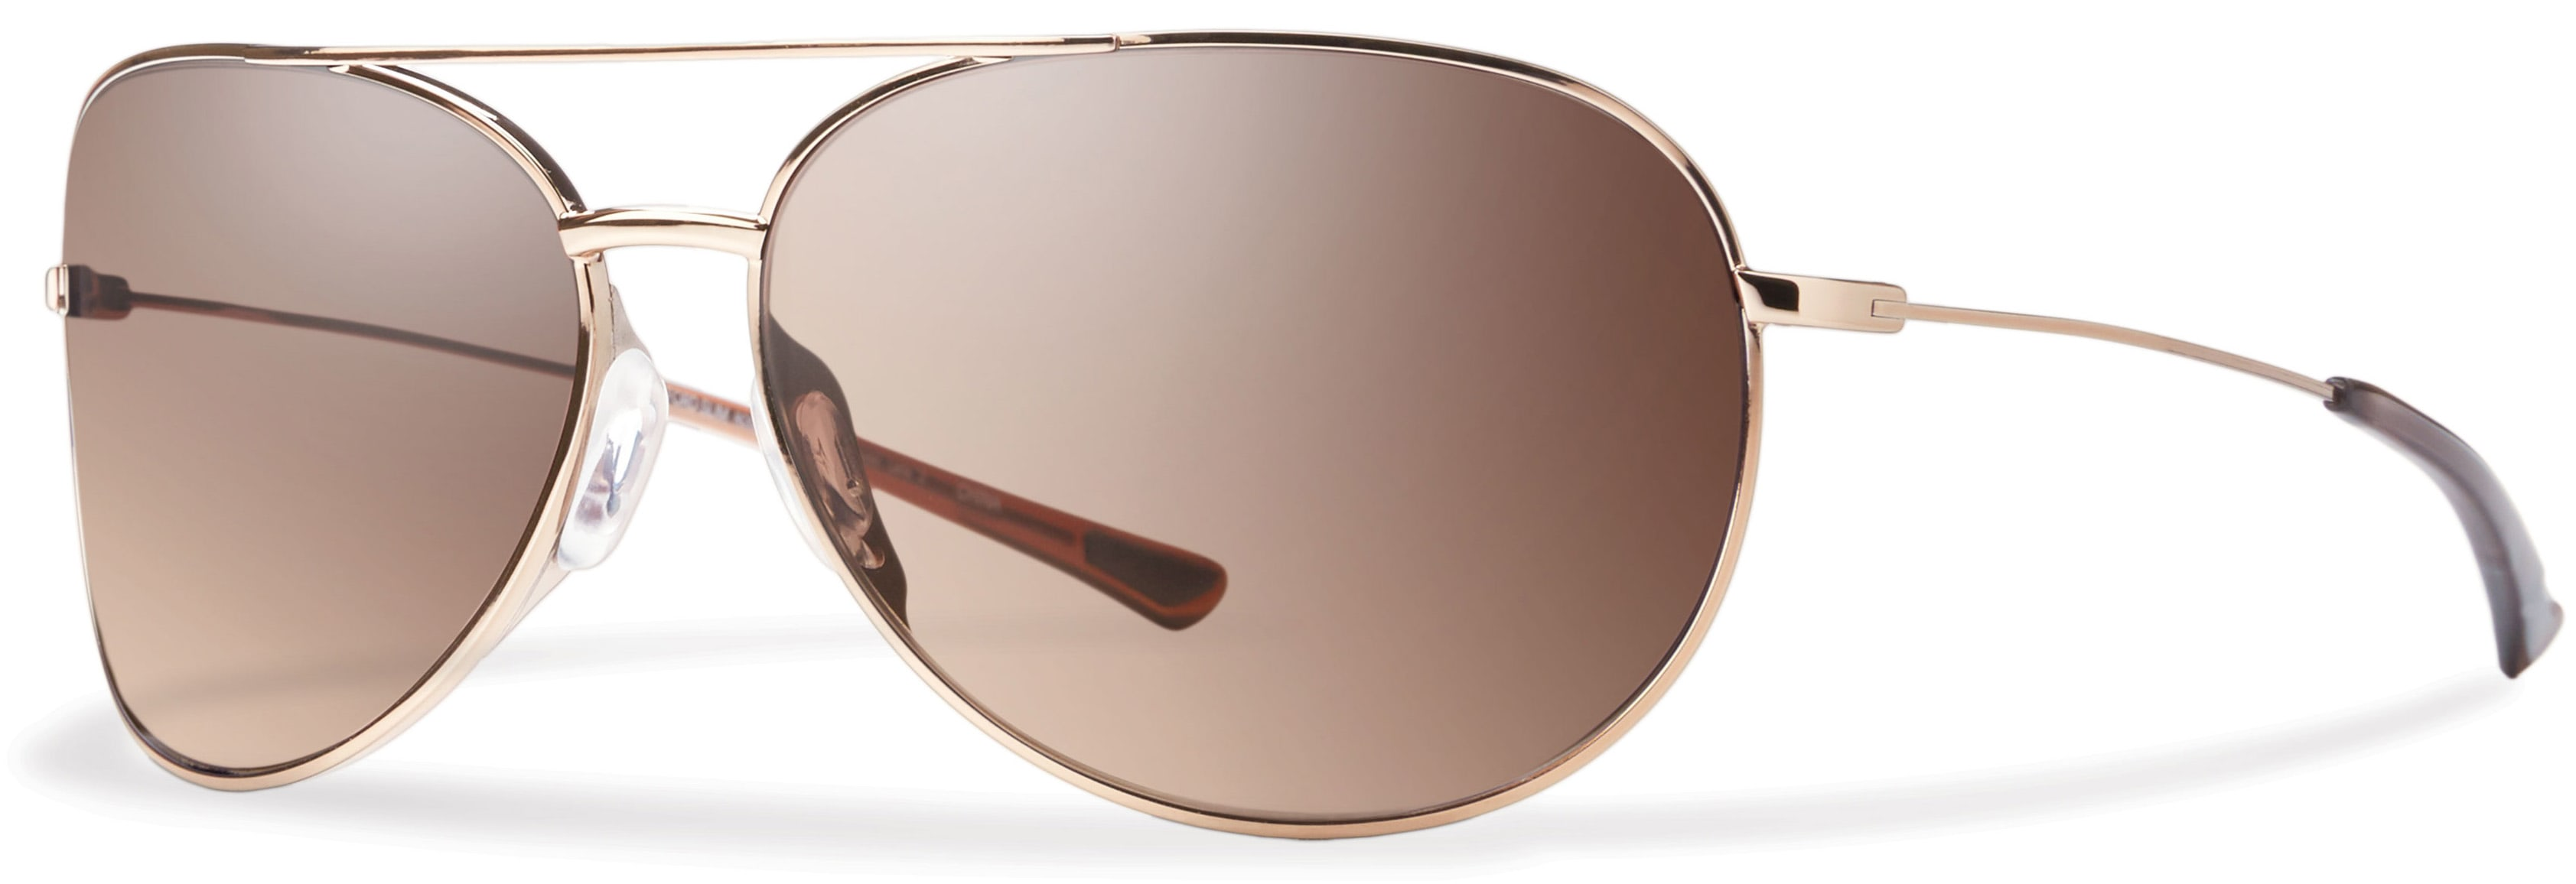 On Sale Smith Rockford Slim Sunglasses